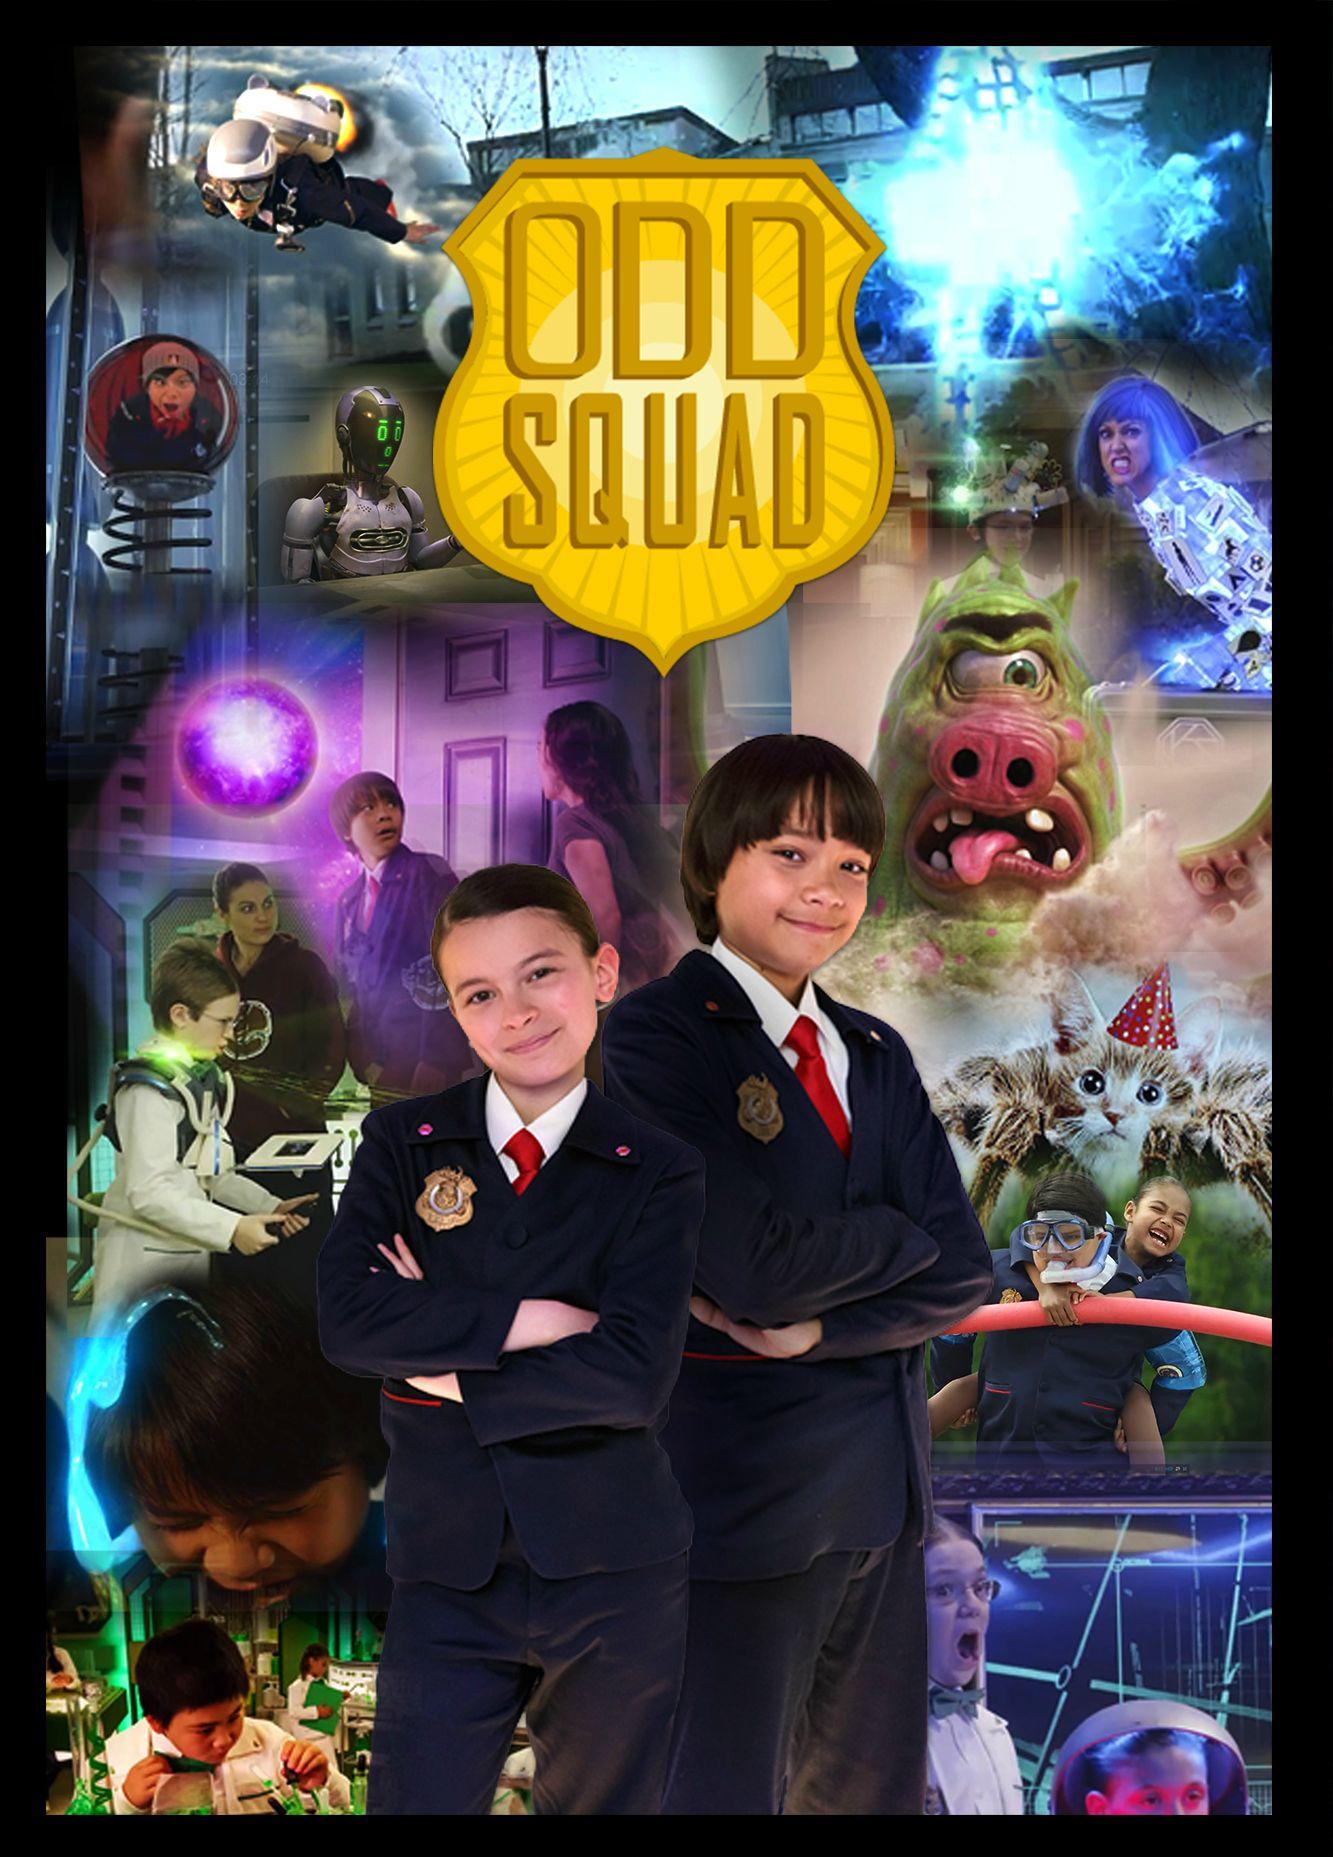 Odd Squad: Season 1